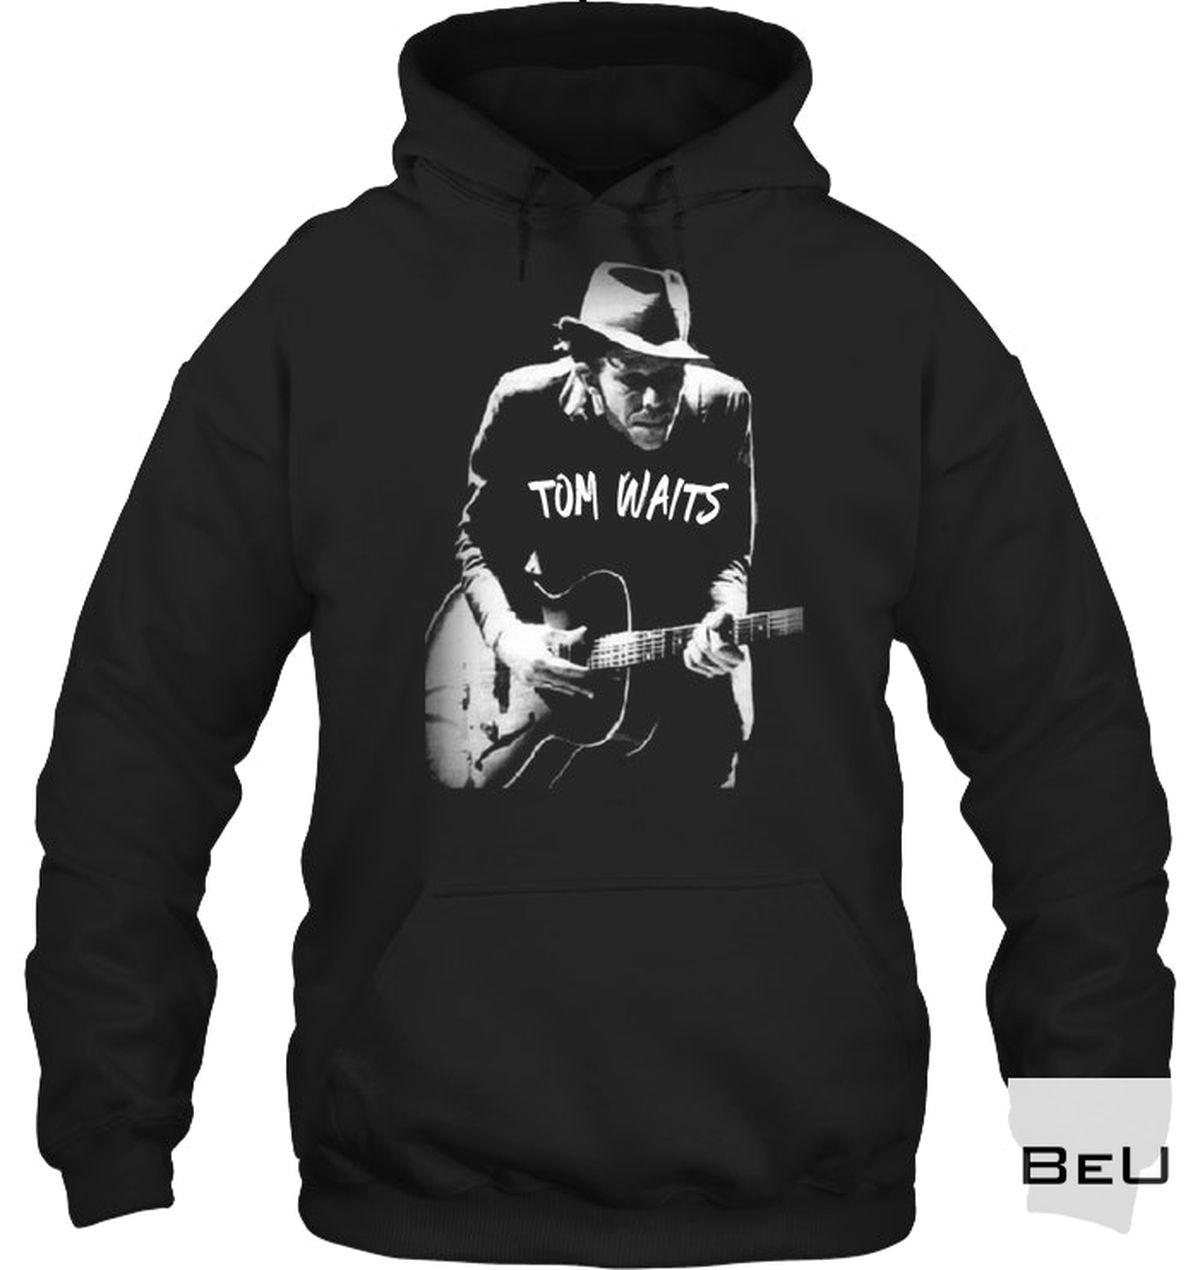 All Over Print Tom Waits Playing Guitar Shirt